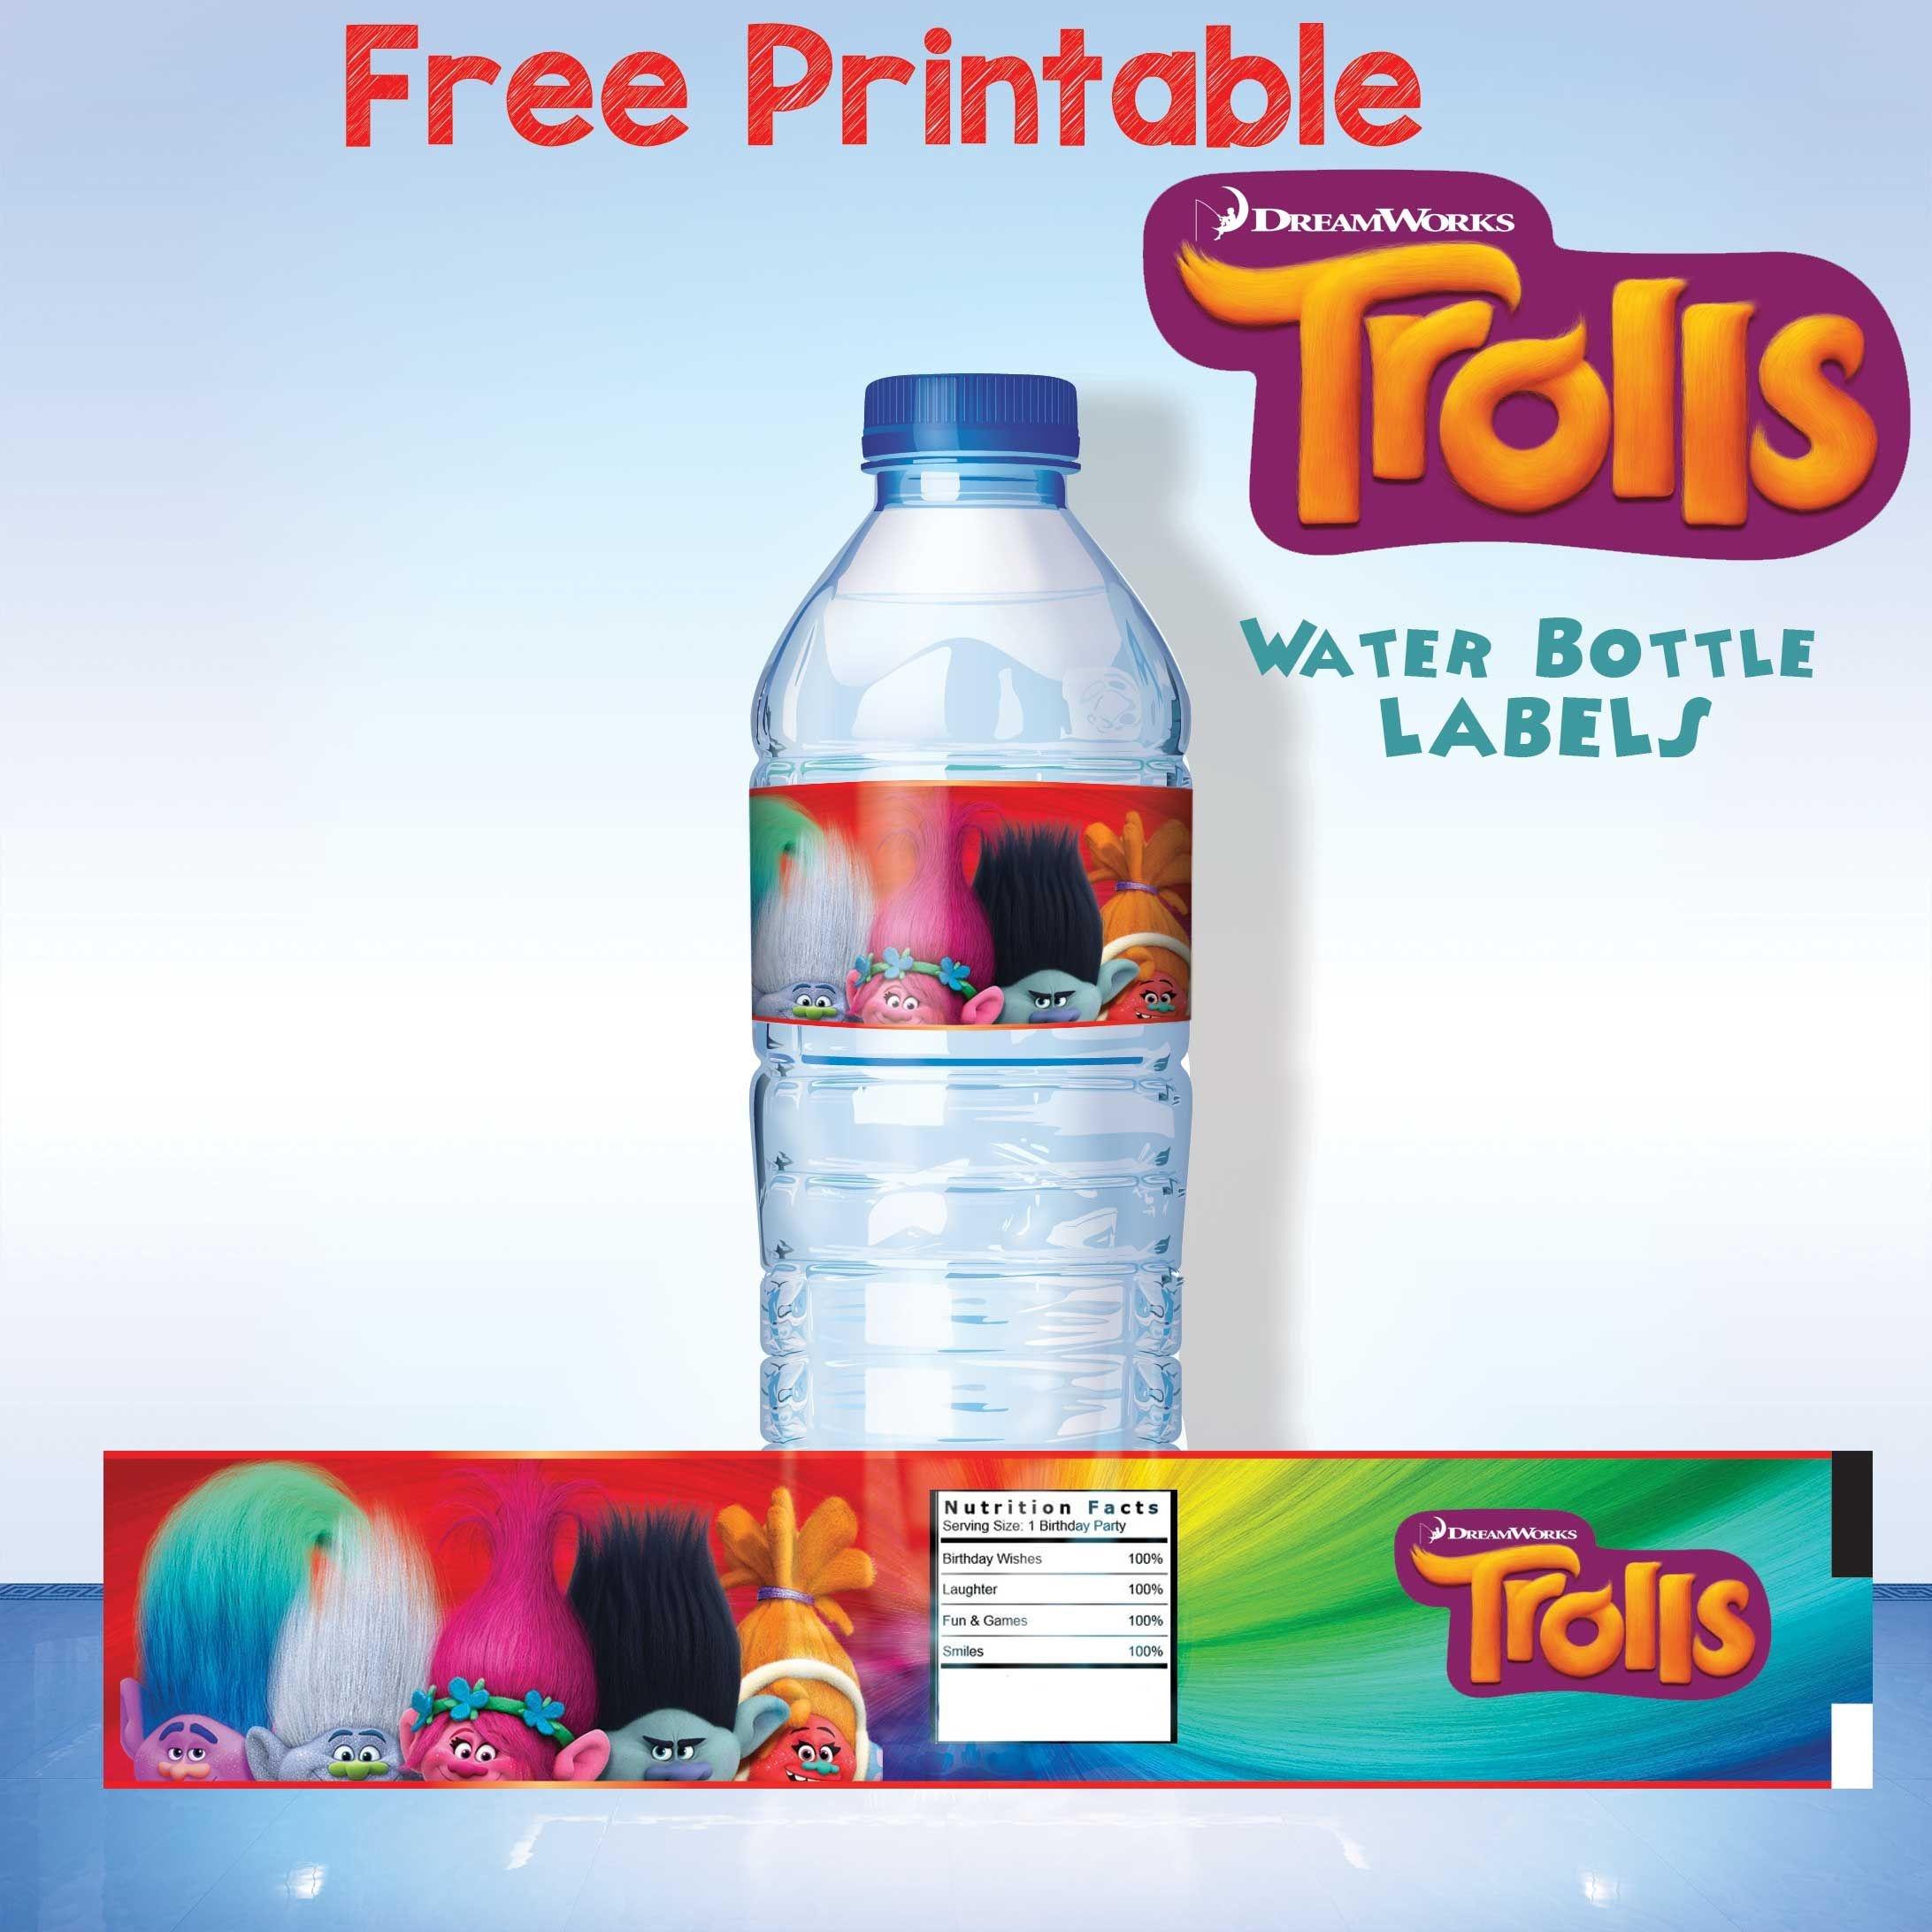 Free Printable Trolls Water Bottle Label   Trolls   Printable Water - Free Printable Water Bottle Labels For Birthday